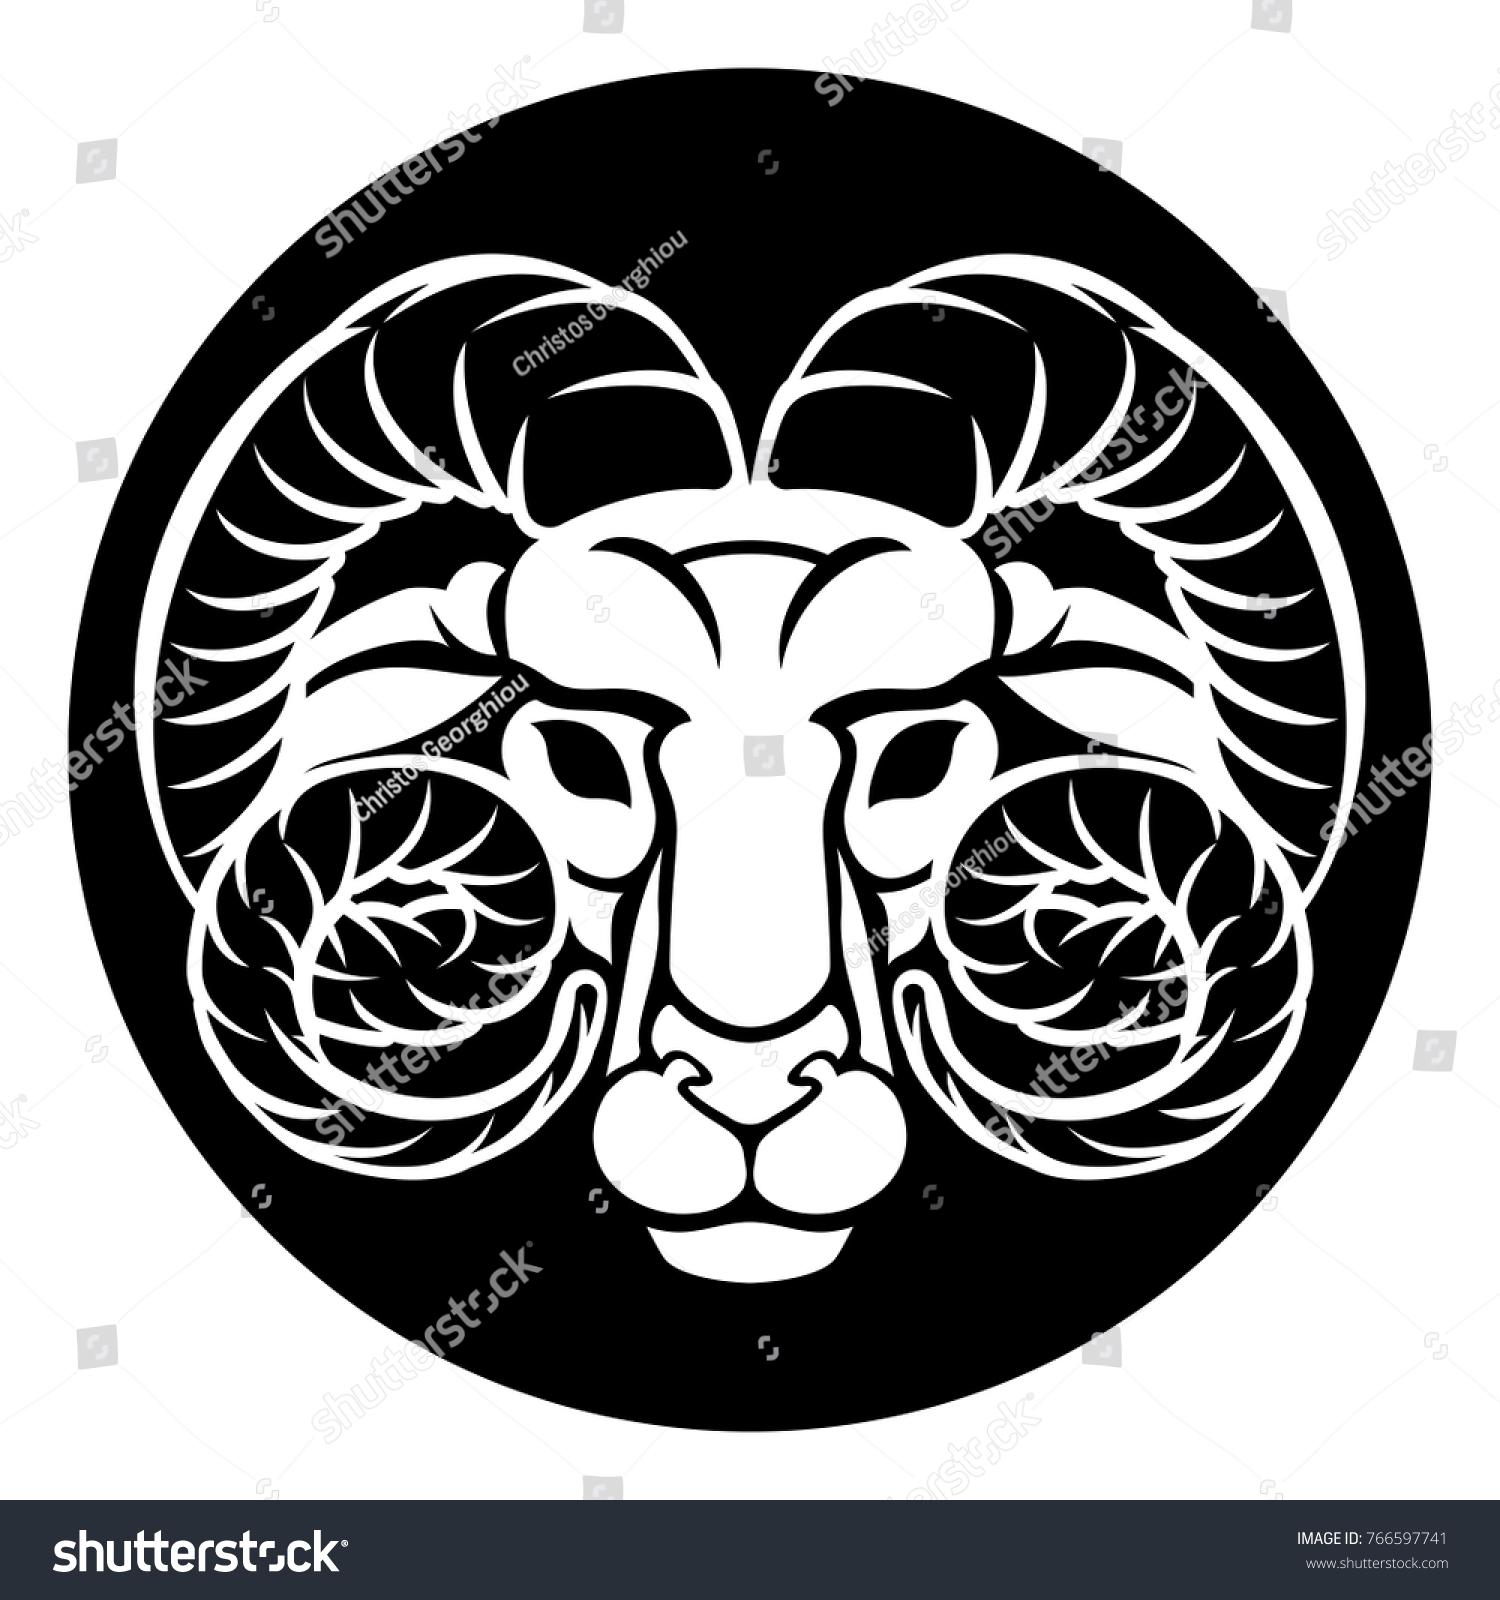 Horoscope Astrology Zodiac Signs Circular Aries Stock Vector